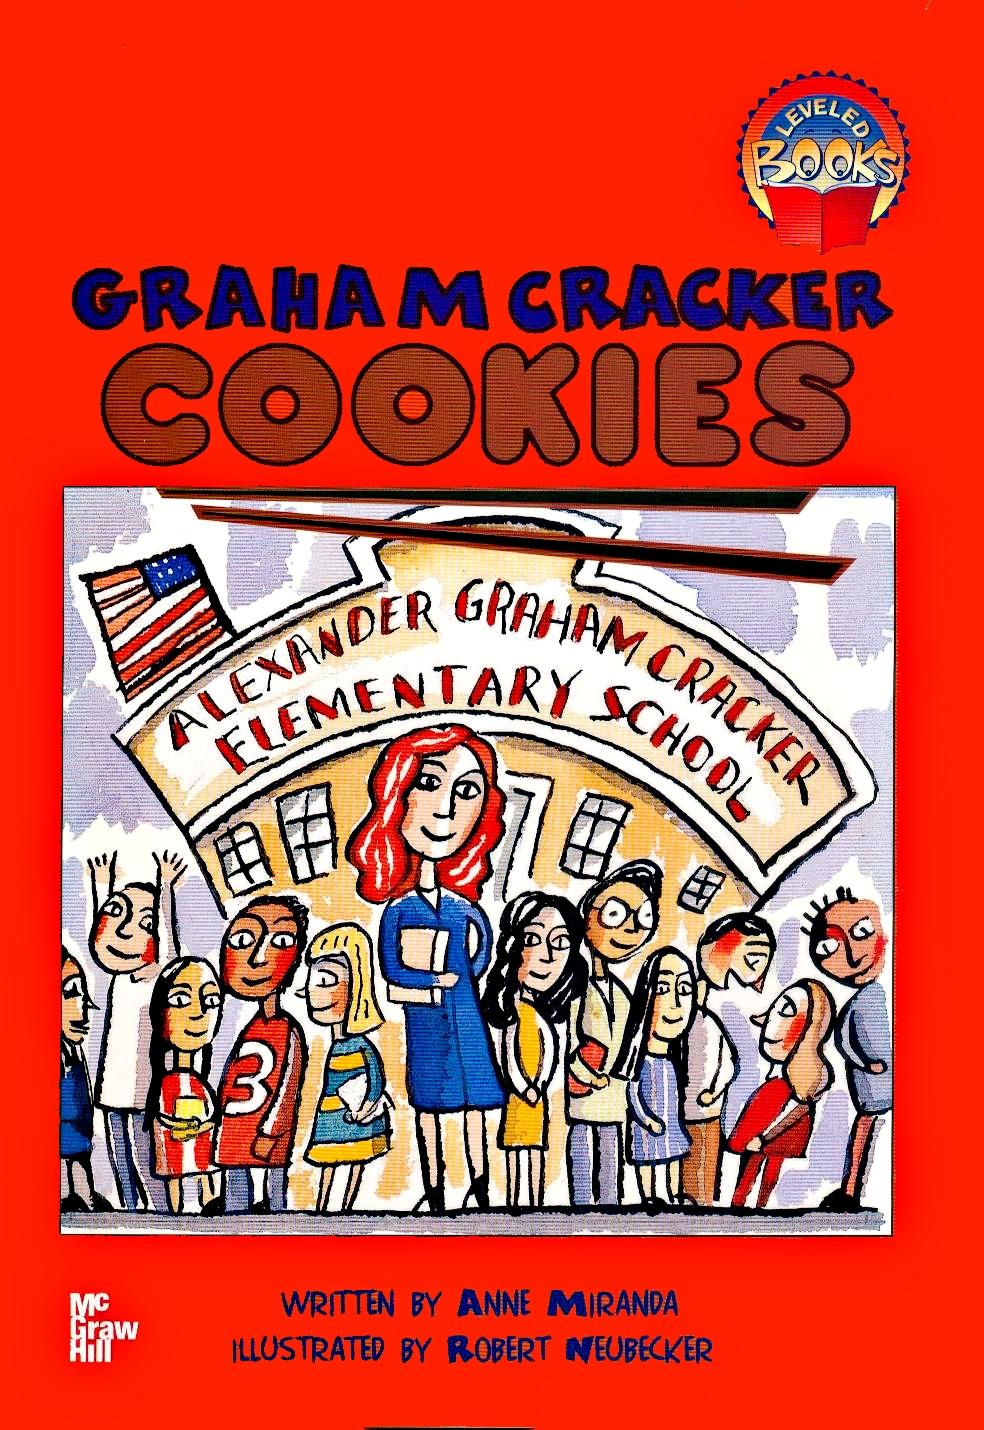 GrahamCrackerCookies.jpg